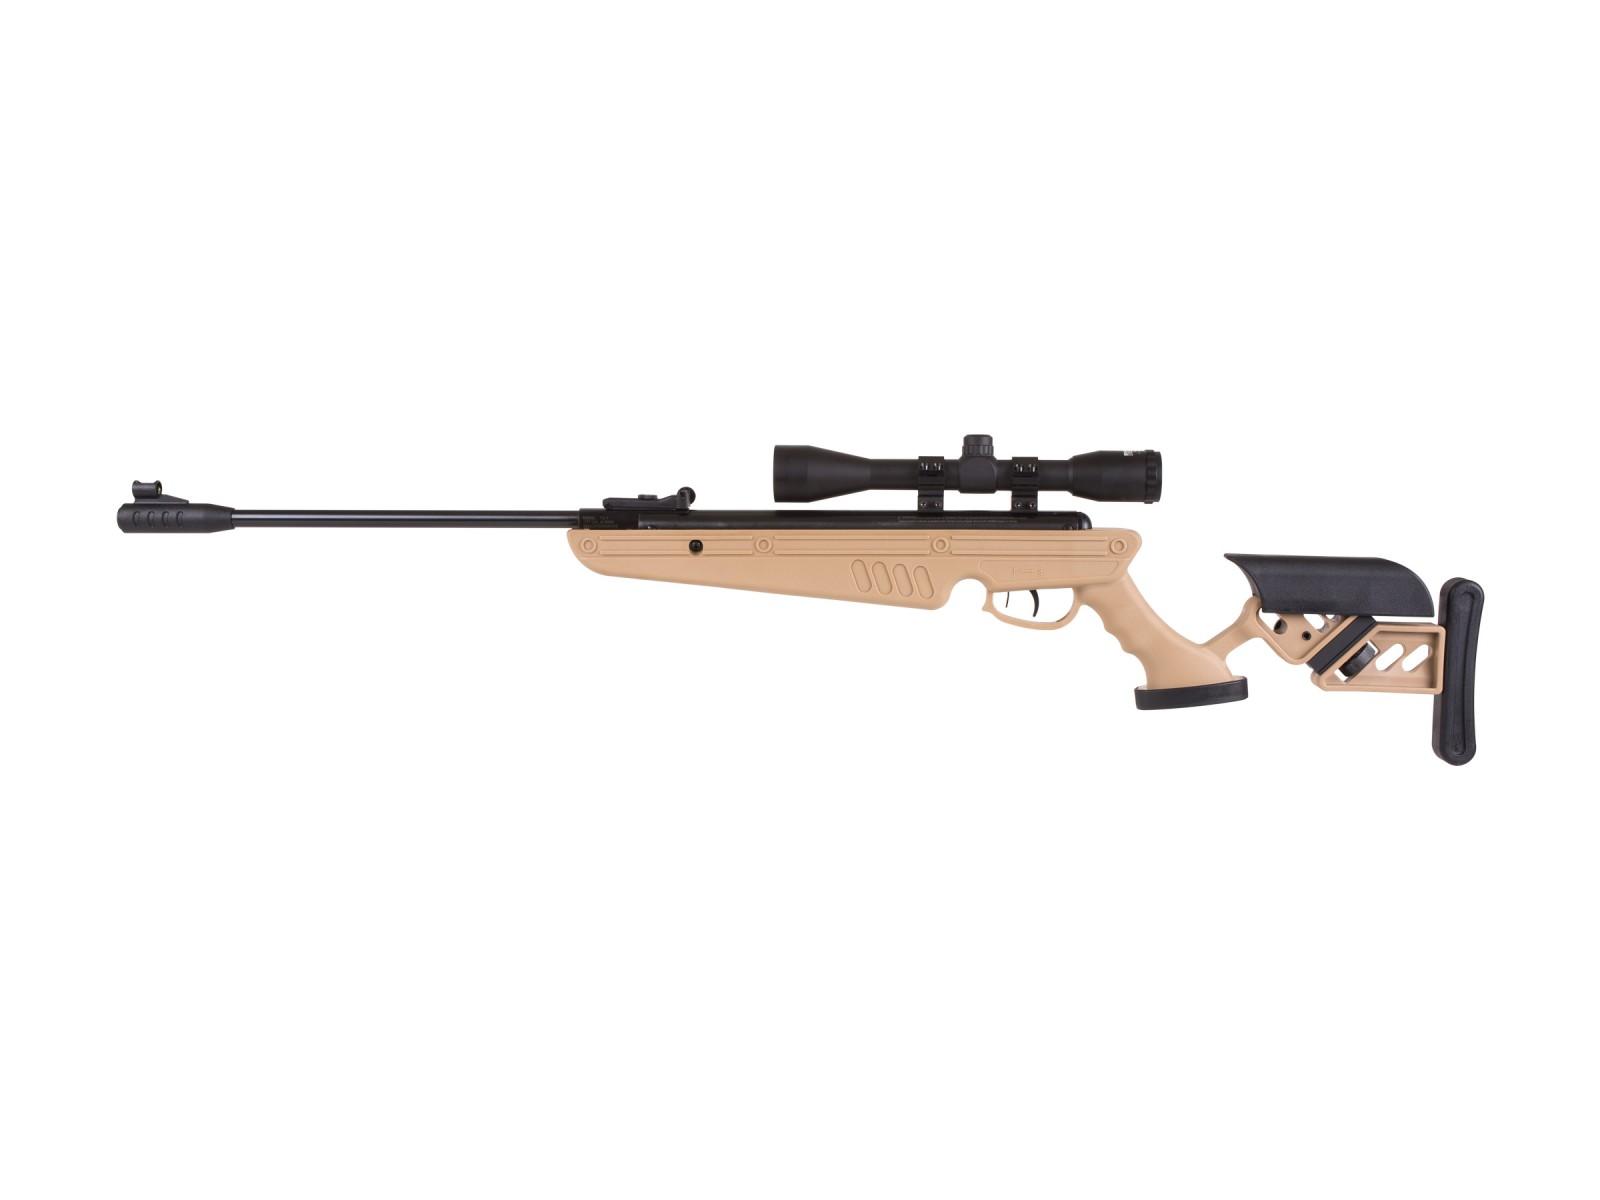 Swiss Arms TG-1 Air Rifle, Tan 0.177 Image